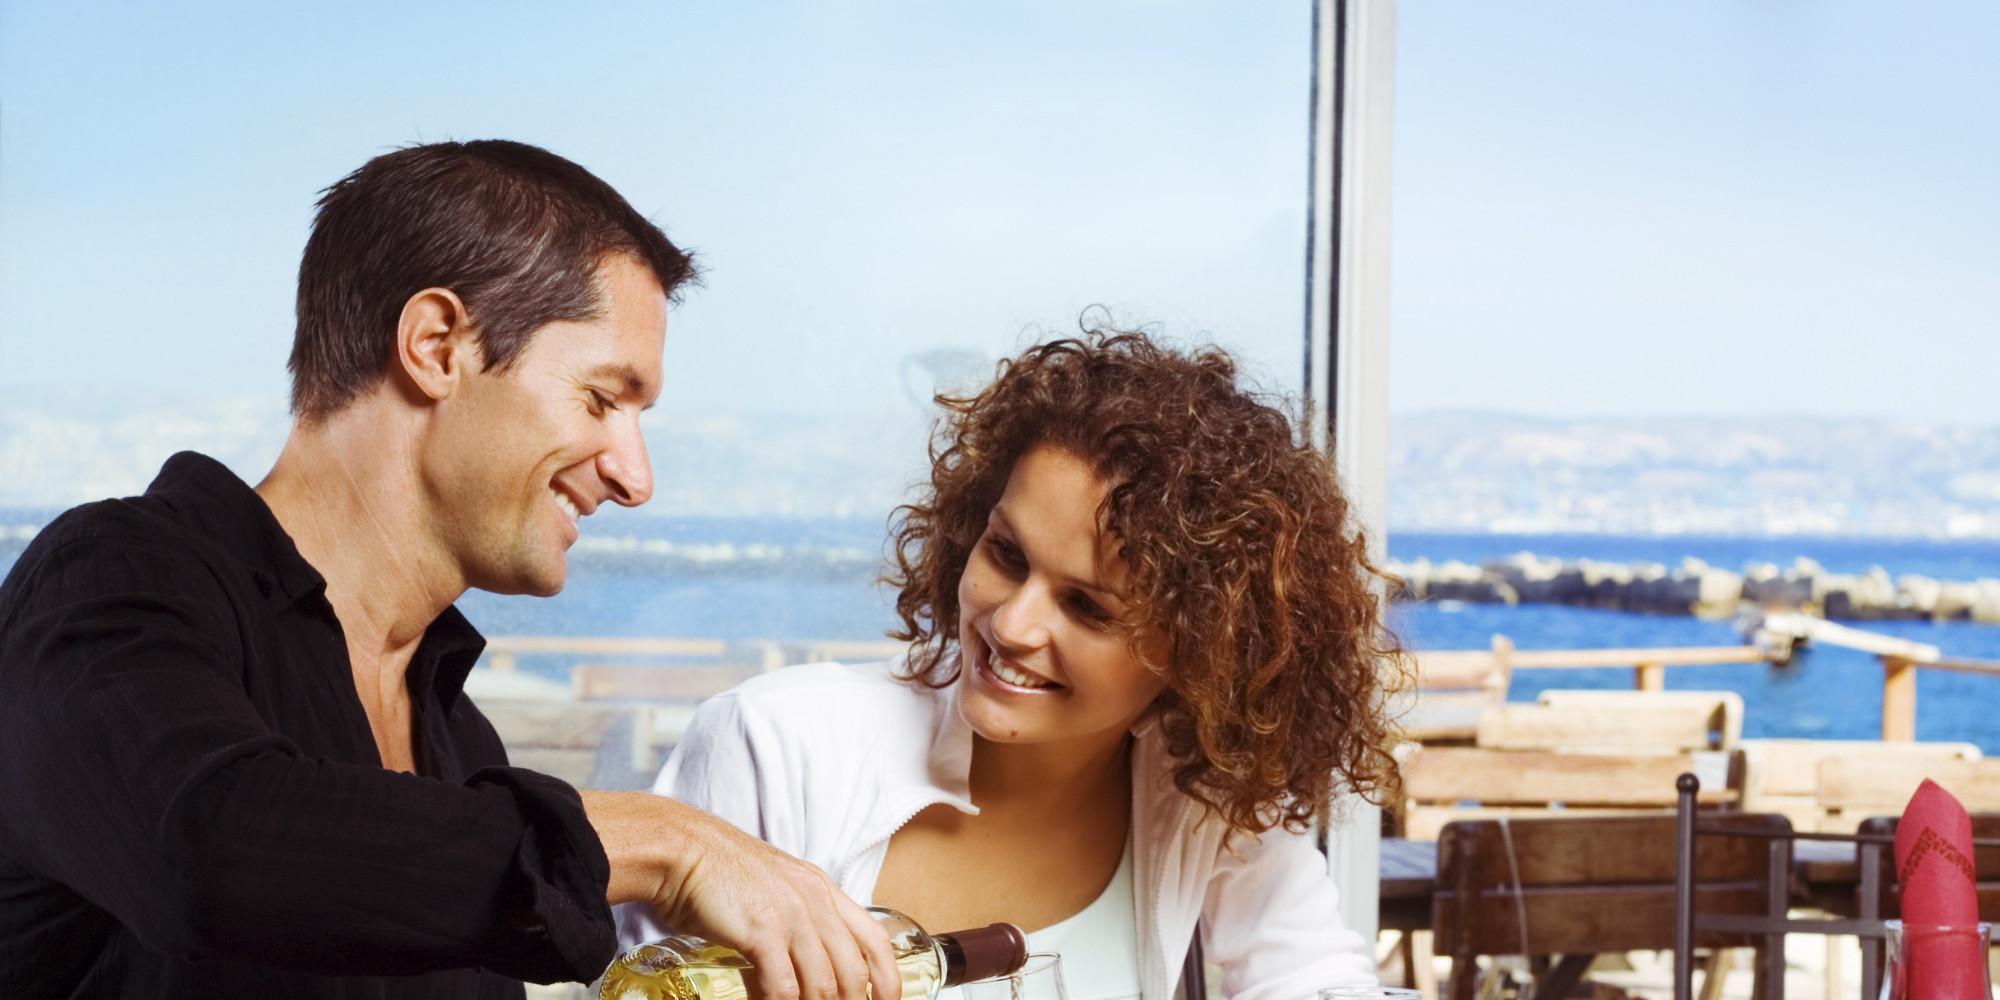 First date at a restaurant